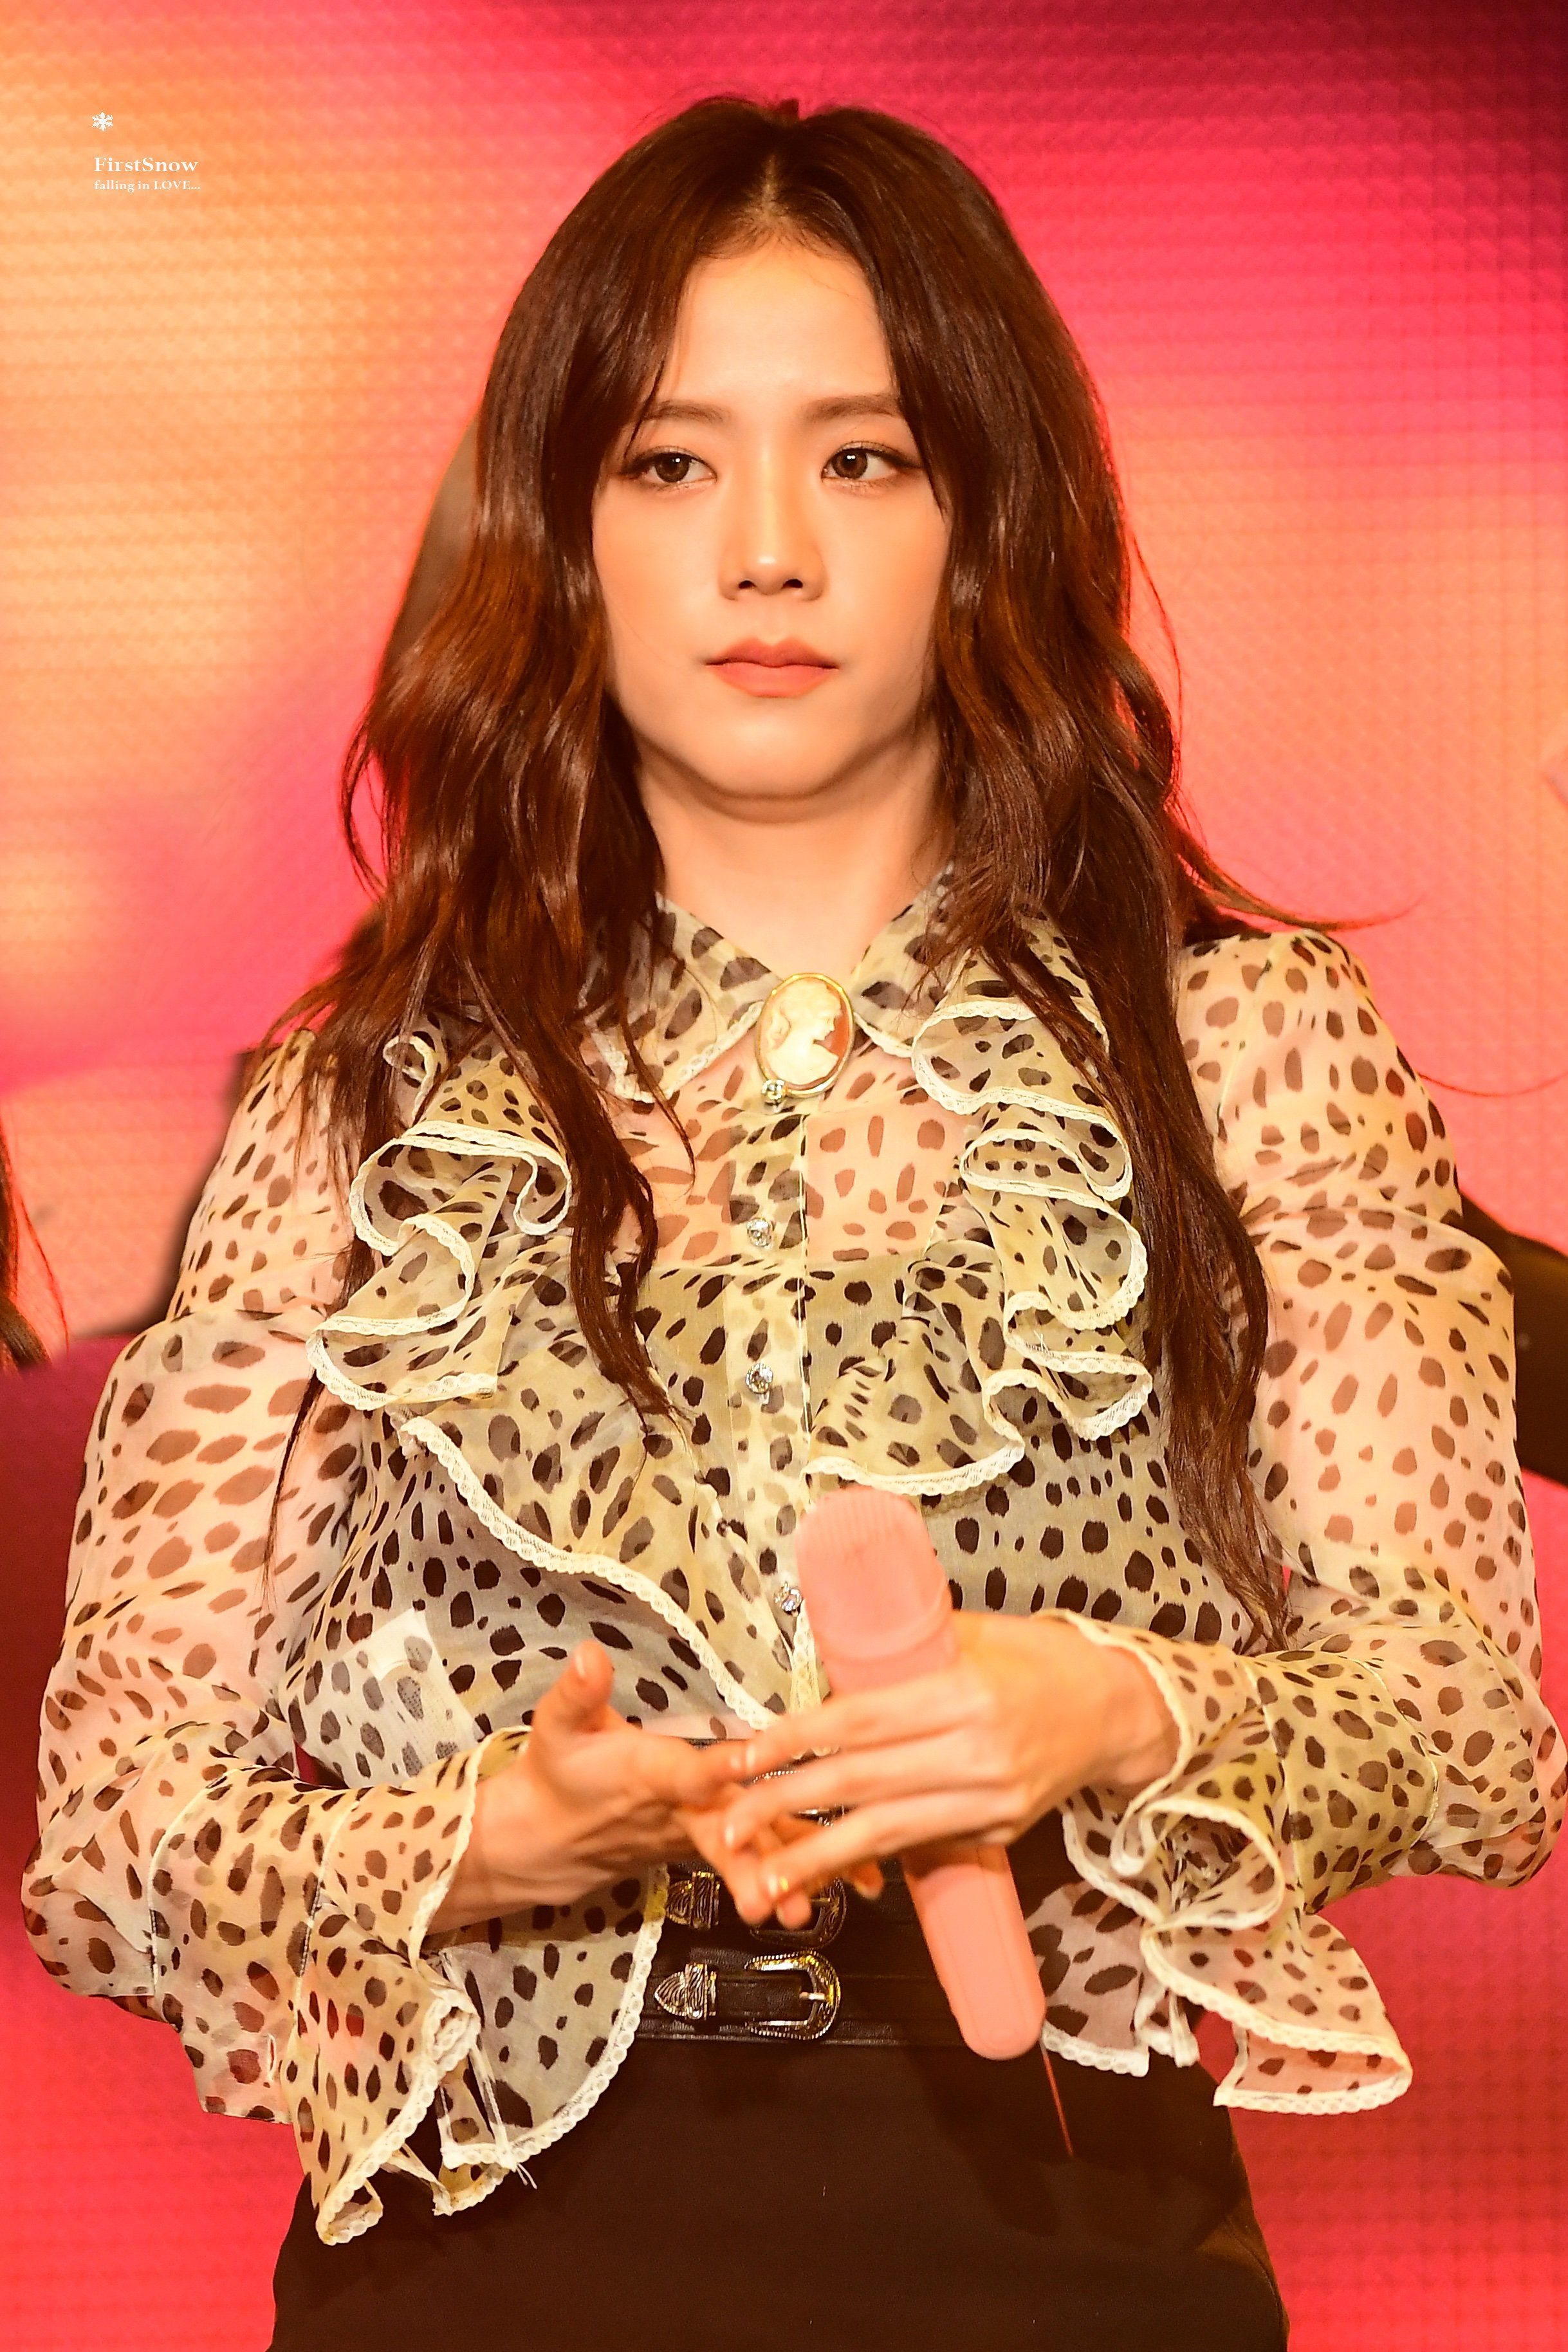 Jisoo Blackpink 190921 2019 Private Stage Fashion Black Pink